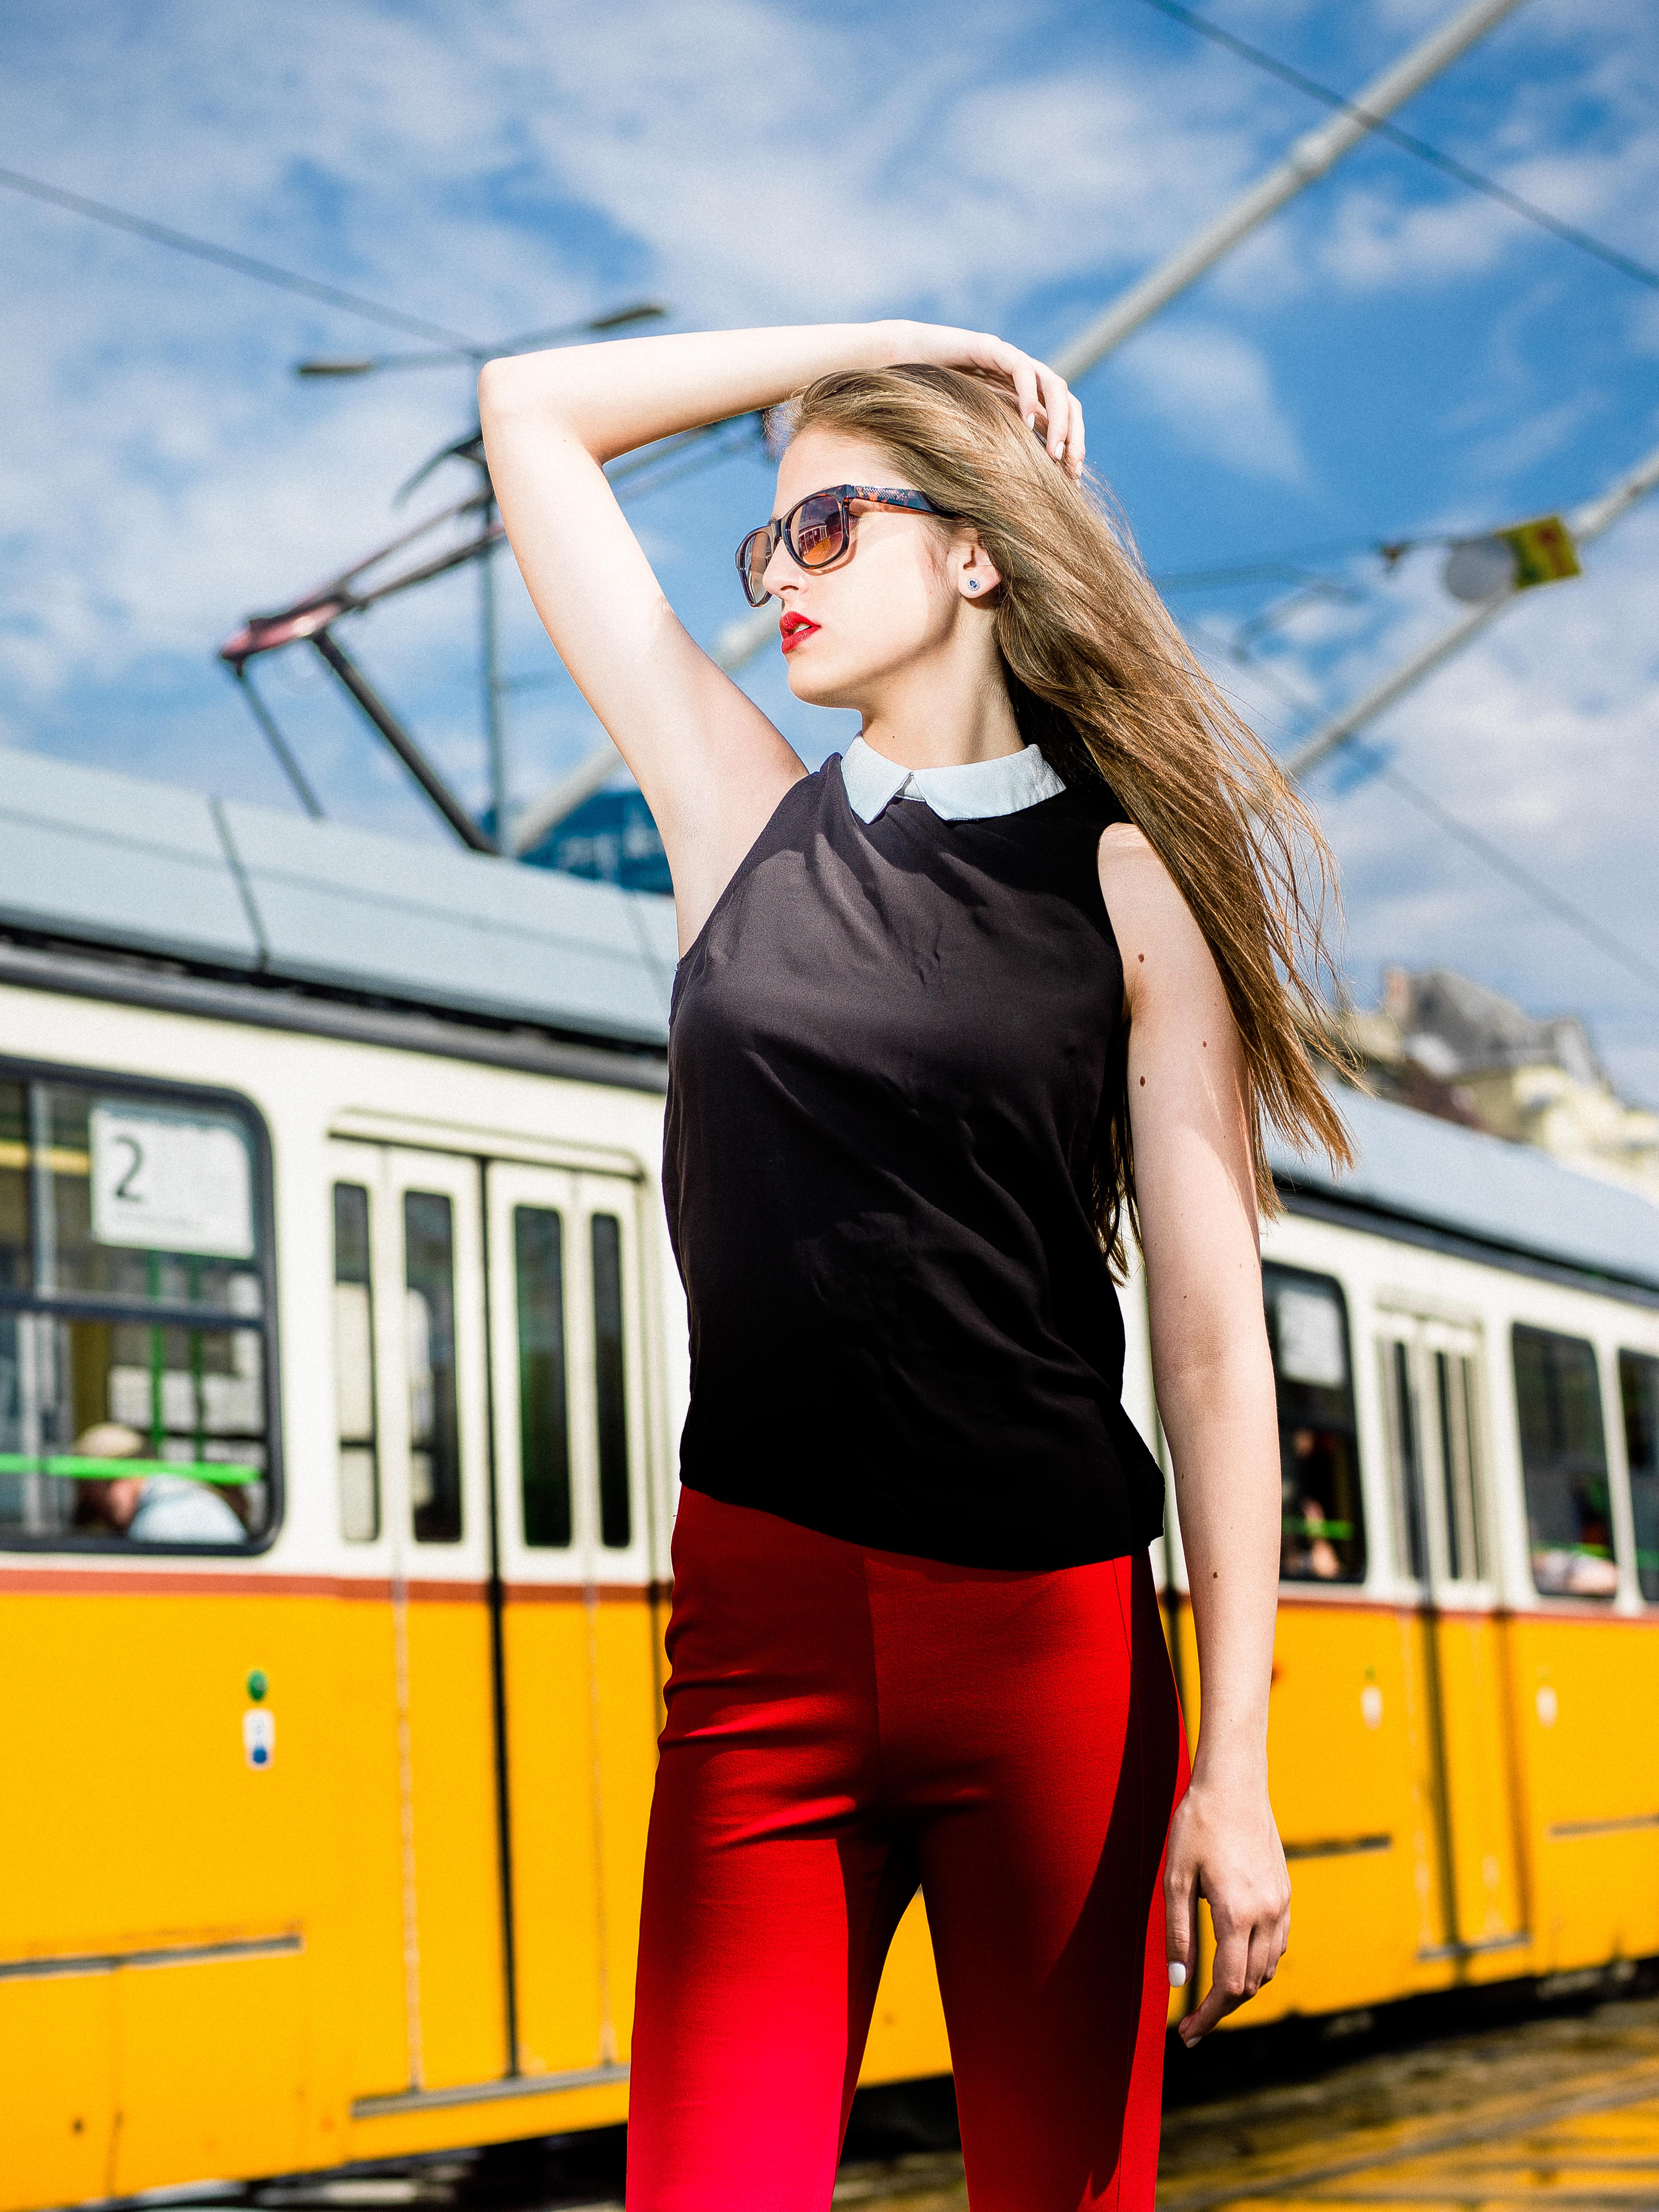 Hasselblad H3D-31 Camera + Budapest Models